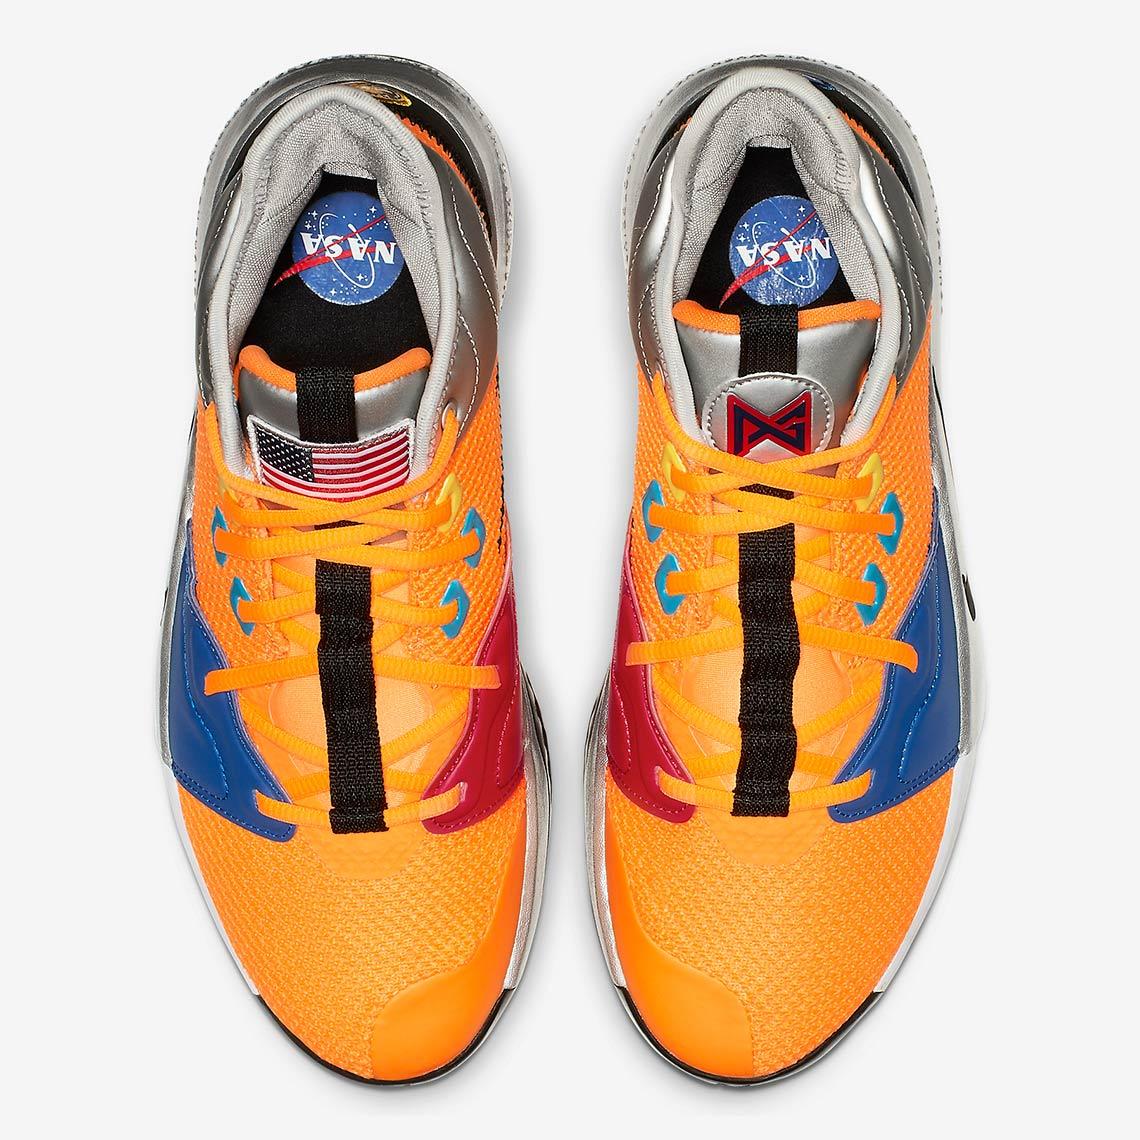 7eed2c5e7b50 Nike PG 3 NASA CI2666-800 Store List Buying Guide